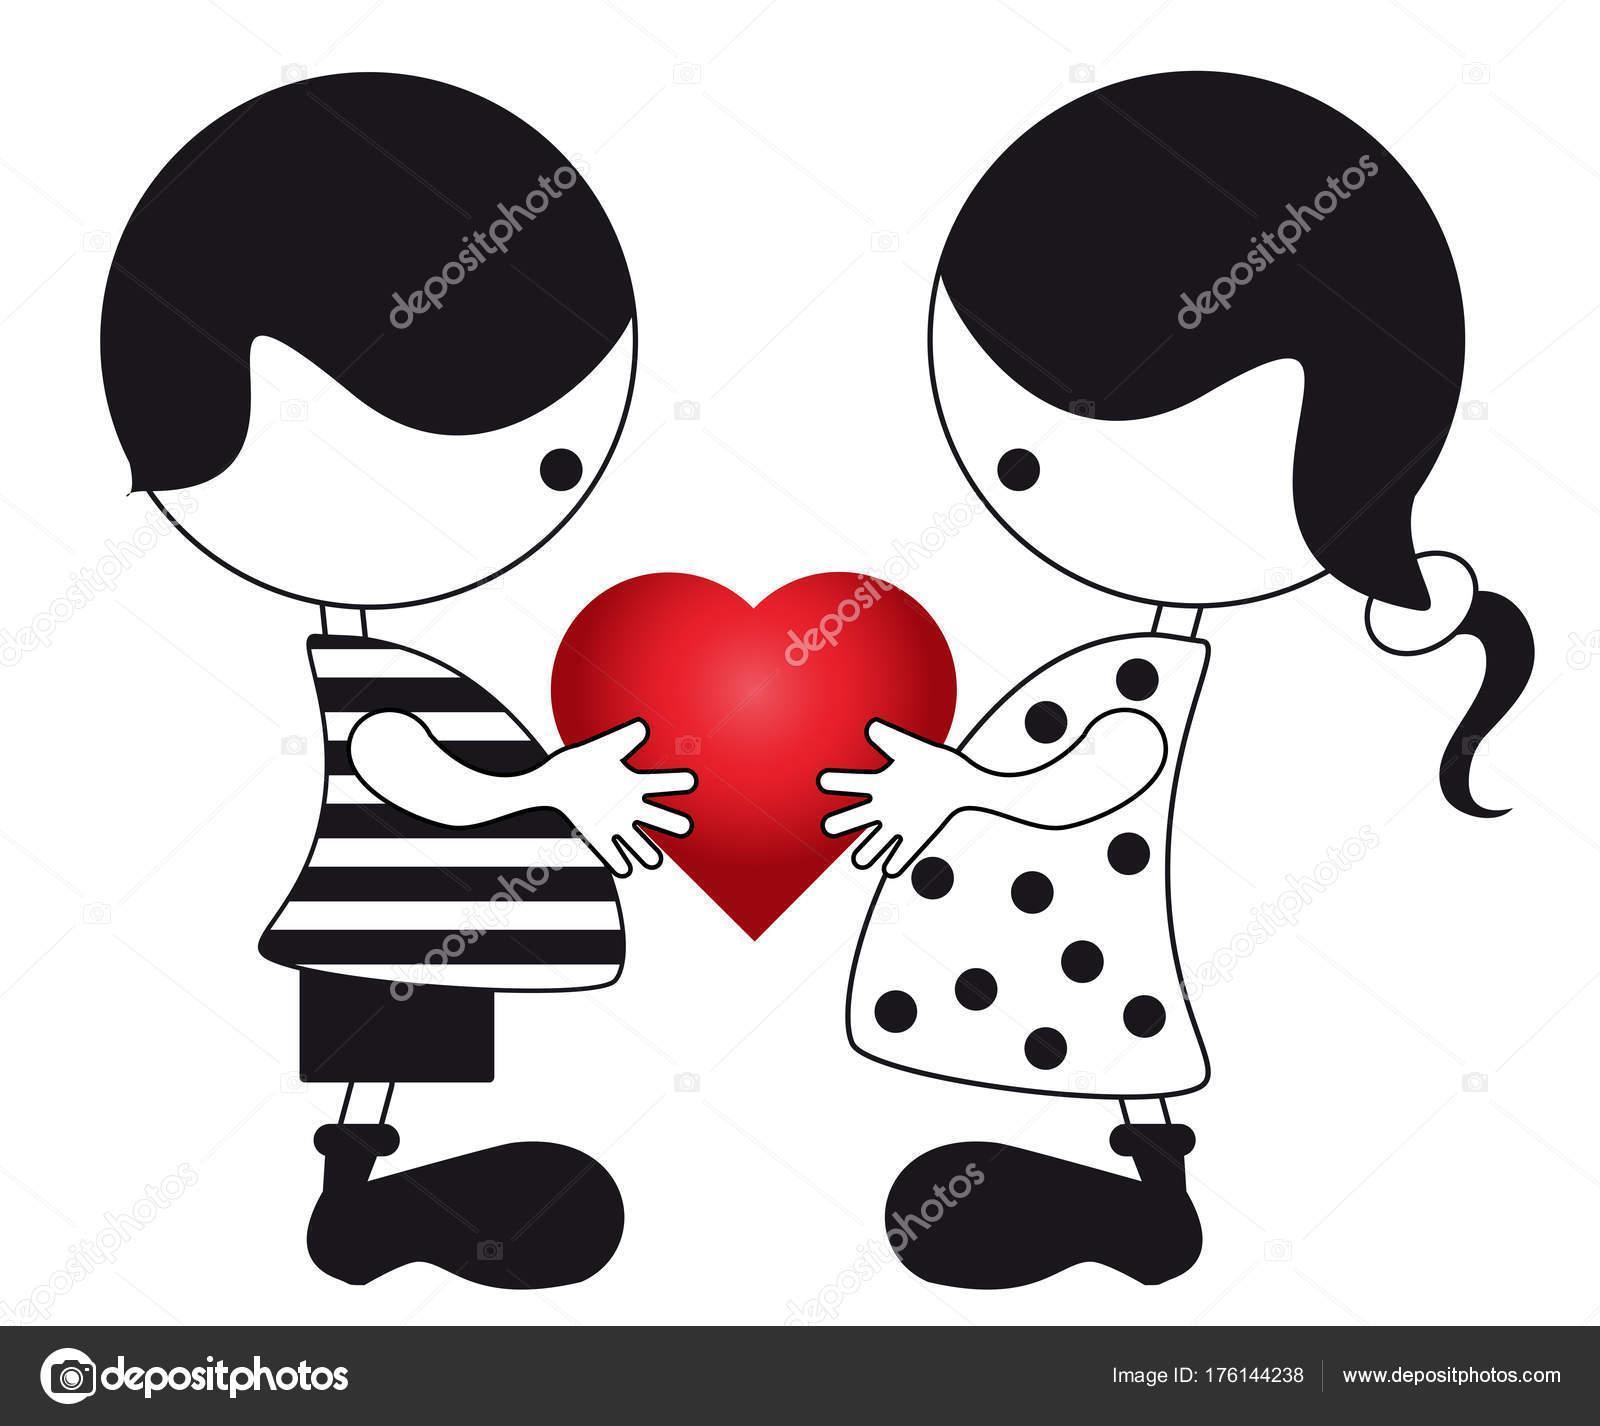 Amor y amistad clipart black and white svg transparent download Wallpaper Amor y Amistad for Android - APK Download svg transparent download